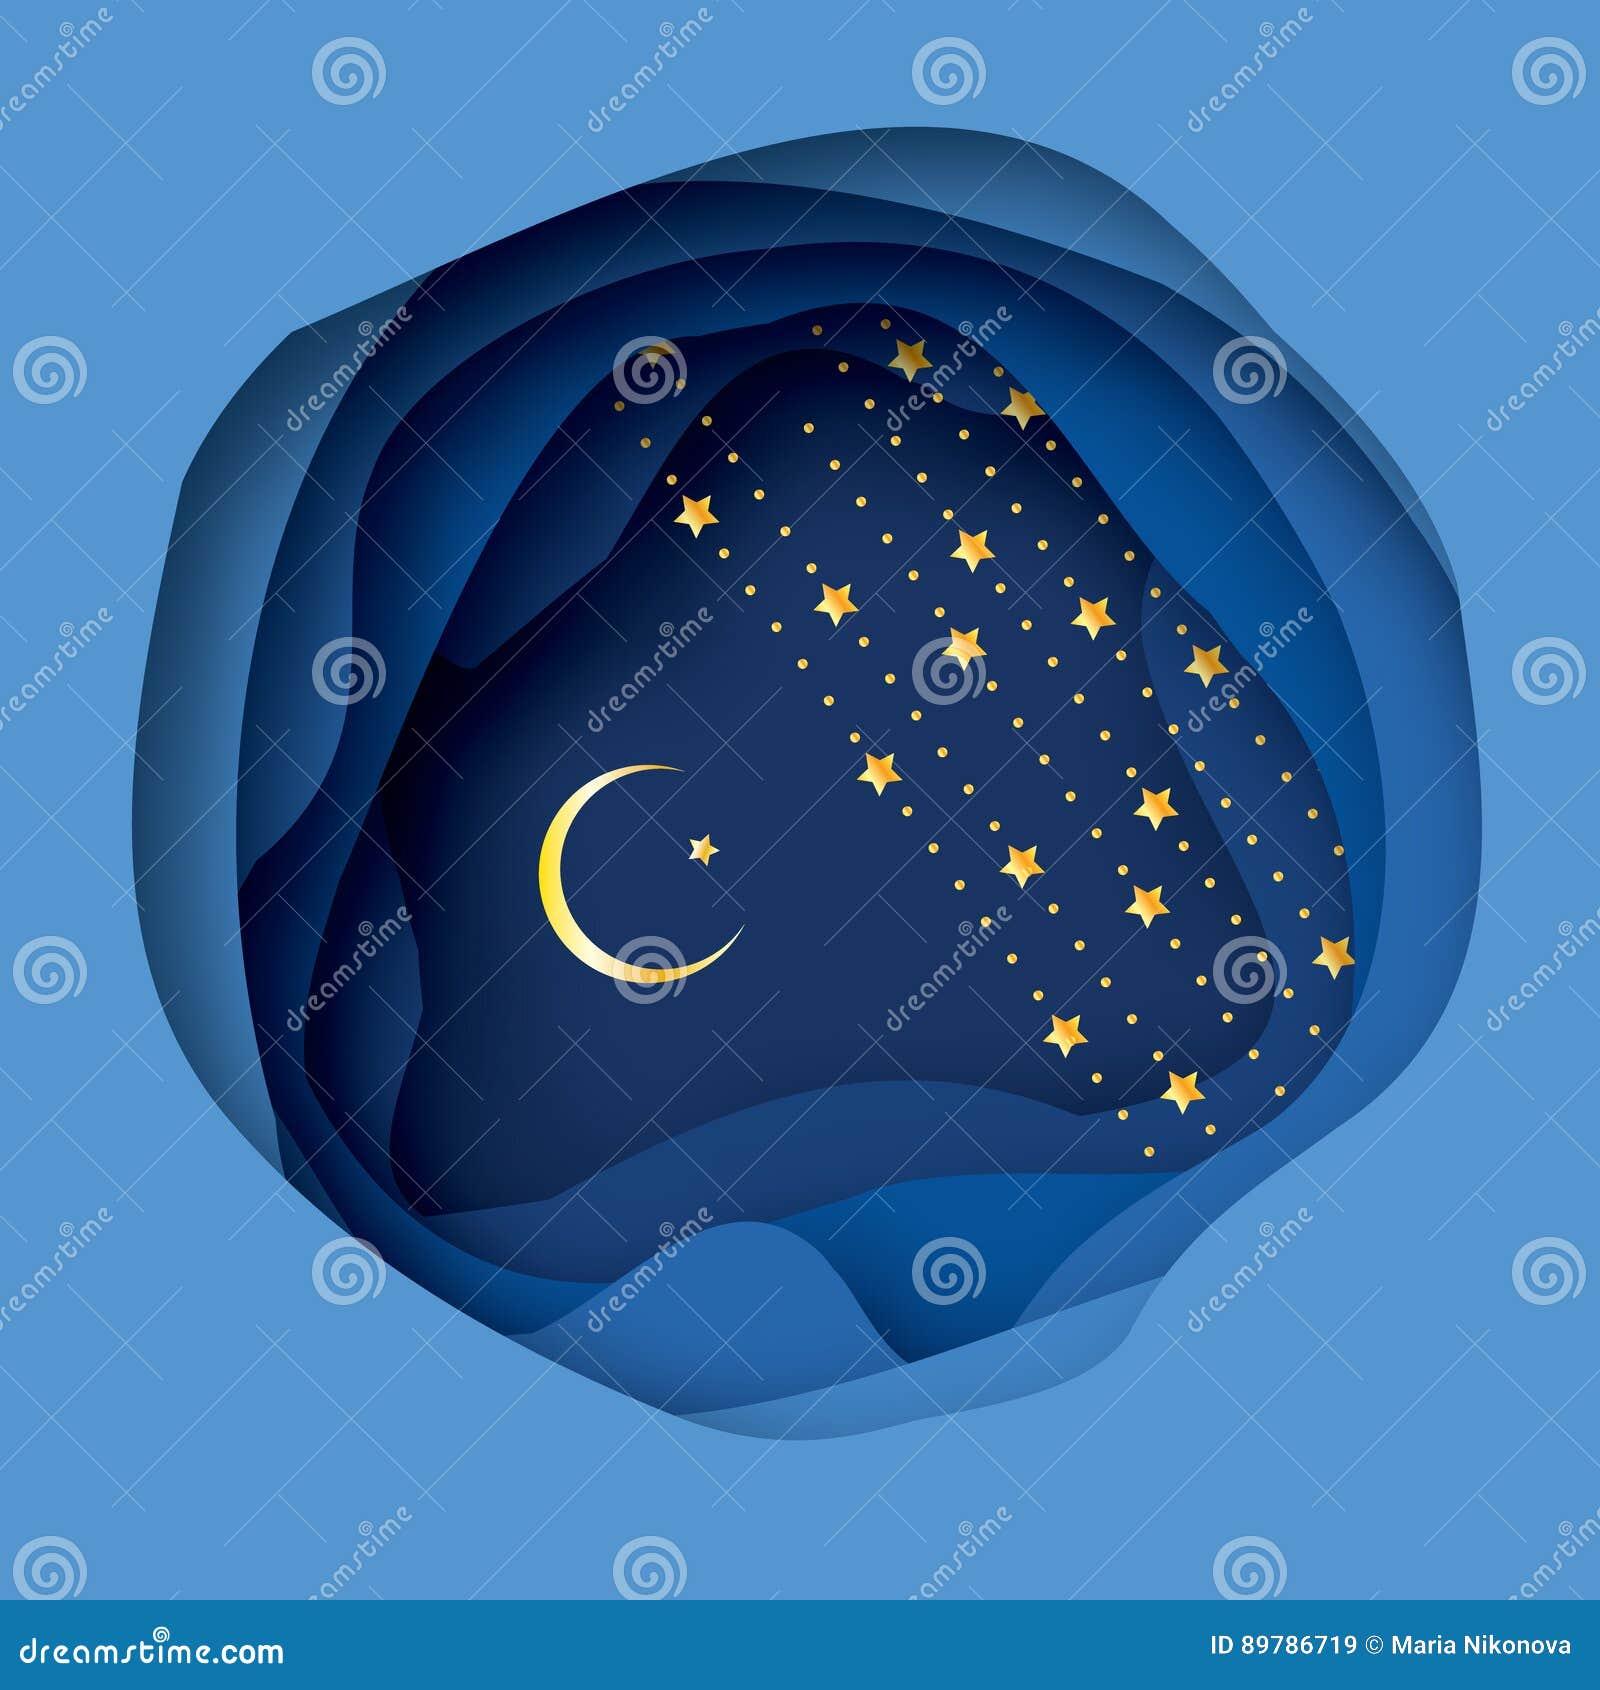 Ramadan kareem greeting card with arabic gold symbol of islam ramadan kareem greeting card with arabic gold symbol of islam crescent moon kristyandbryce Image collections